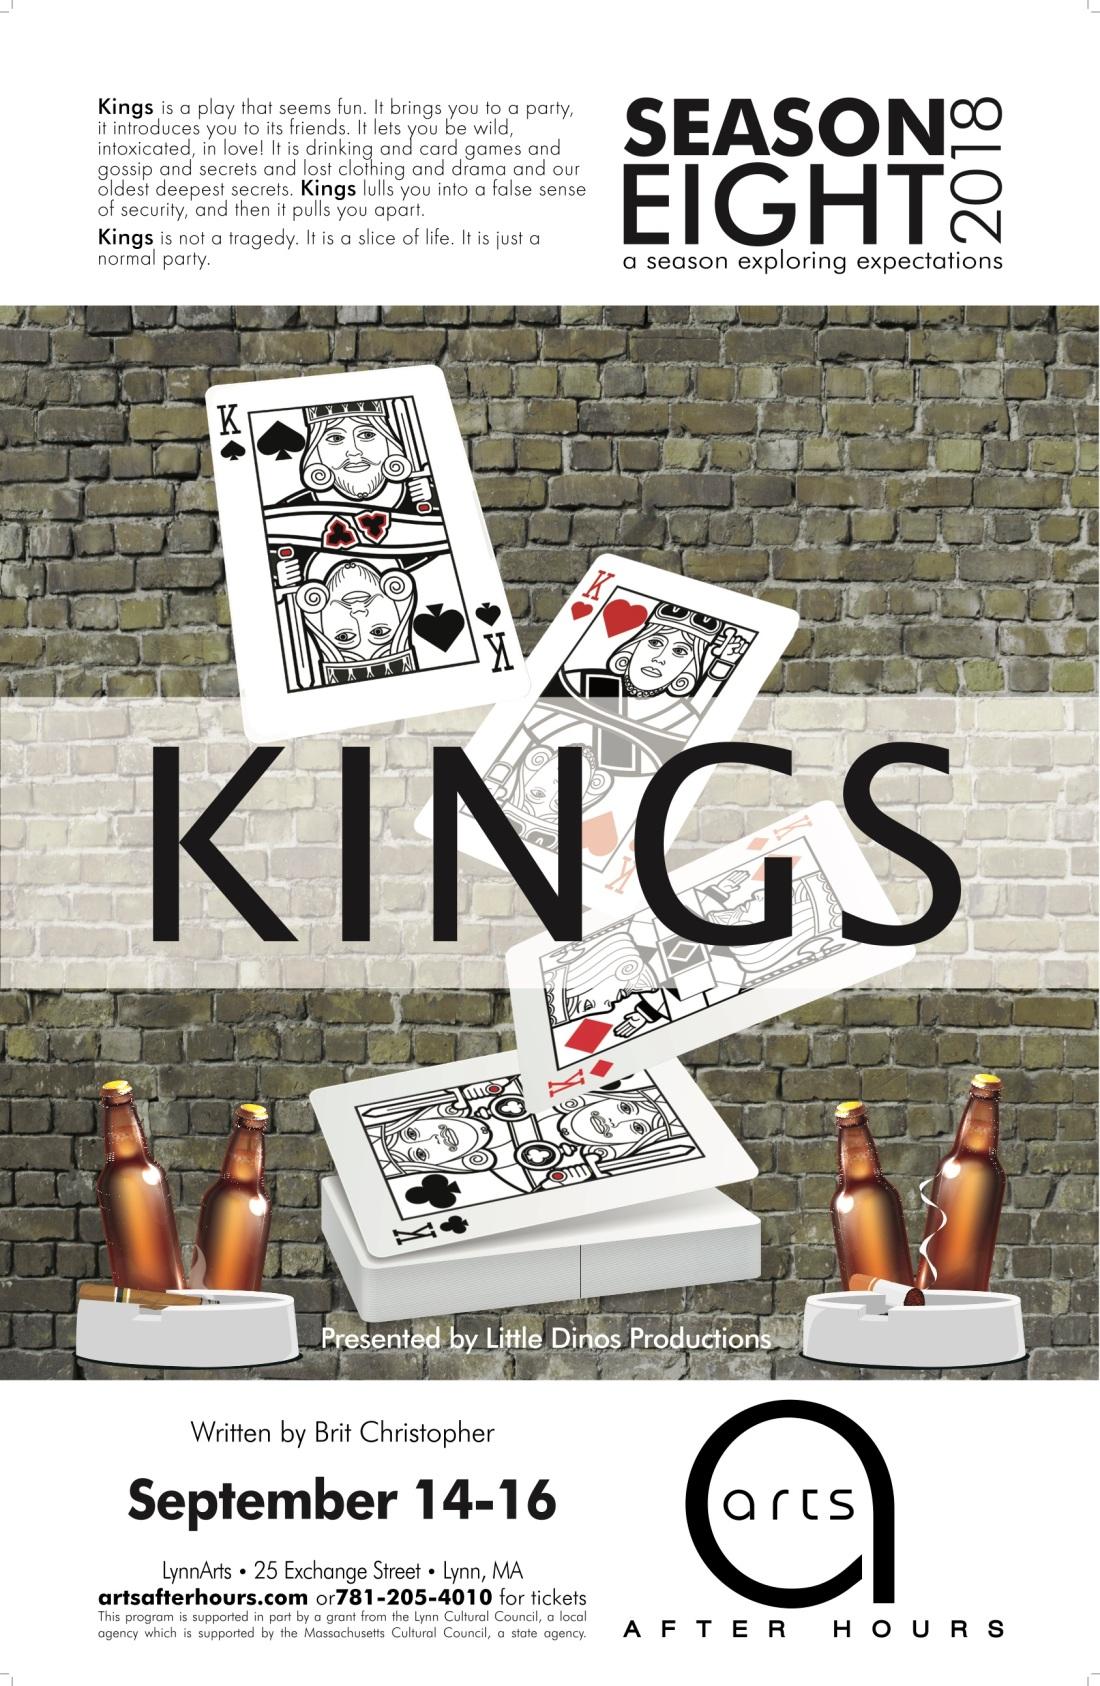 2018-kings-poster-11x17-final